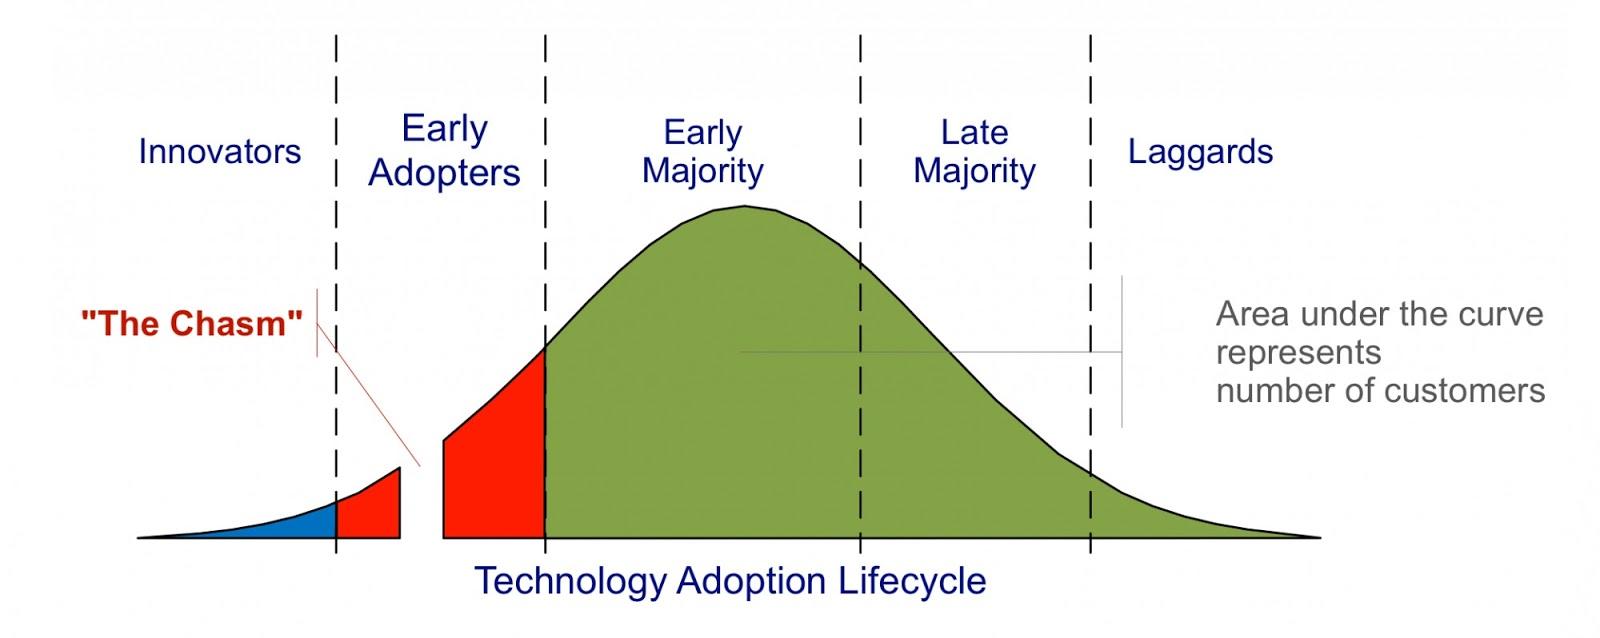 Teknoloji Adaptasyon Yaşam Döngüsü